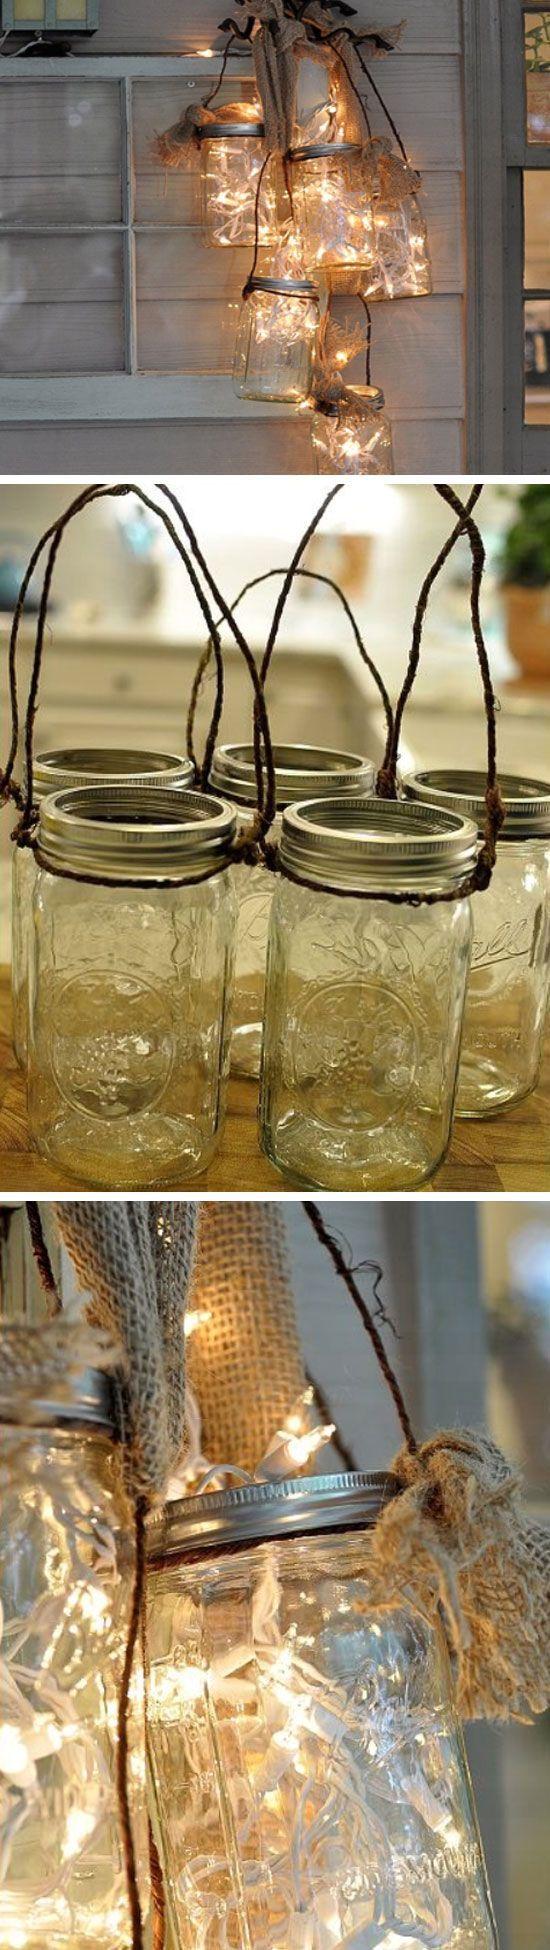 how to make mason jar lights for outside